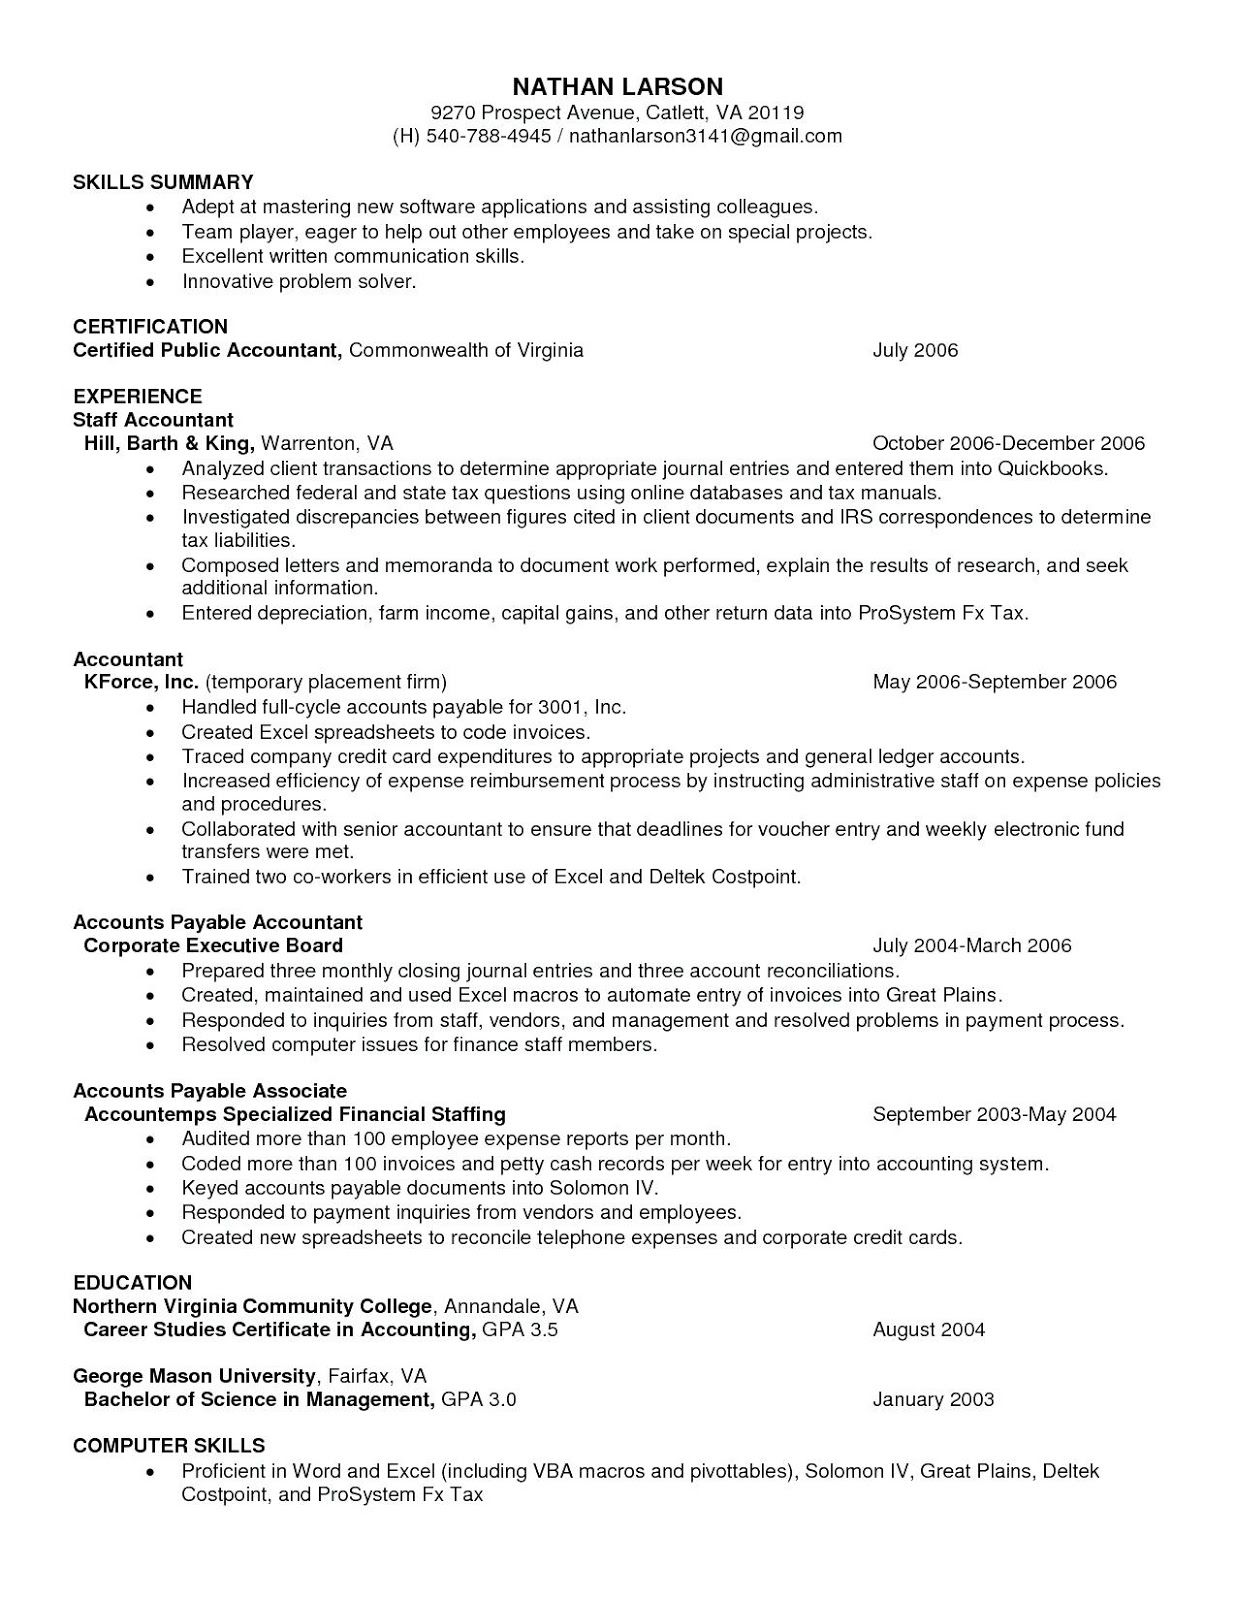 Accounts Payable Resume Format Accounts Payable Resume Format In India Accounts Payable Resume Format For B Best Resume Template Resume Templates Resume Format